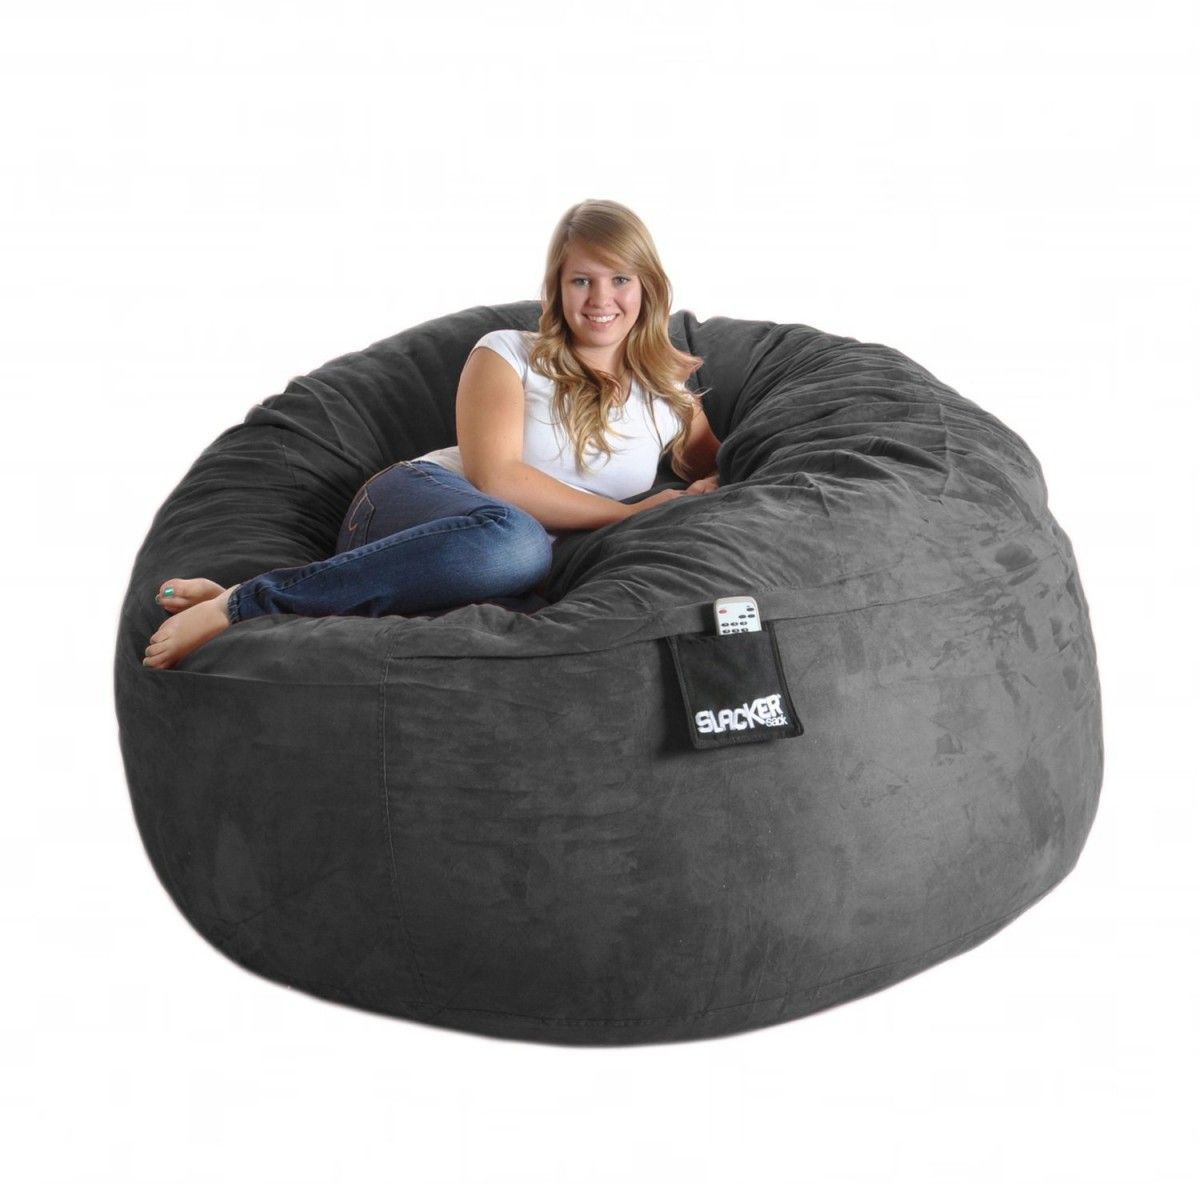 Making Oversized Bean Bag Chairs Foam Padding  httpwww